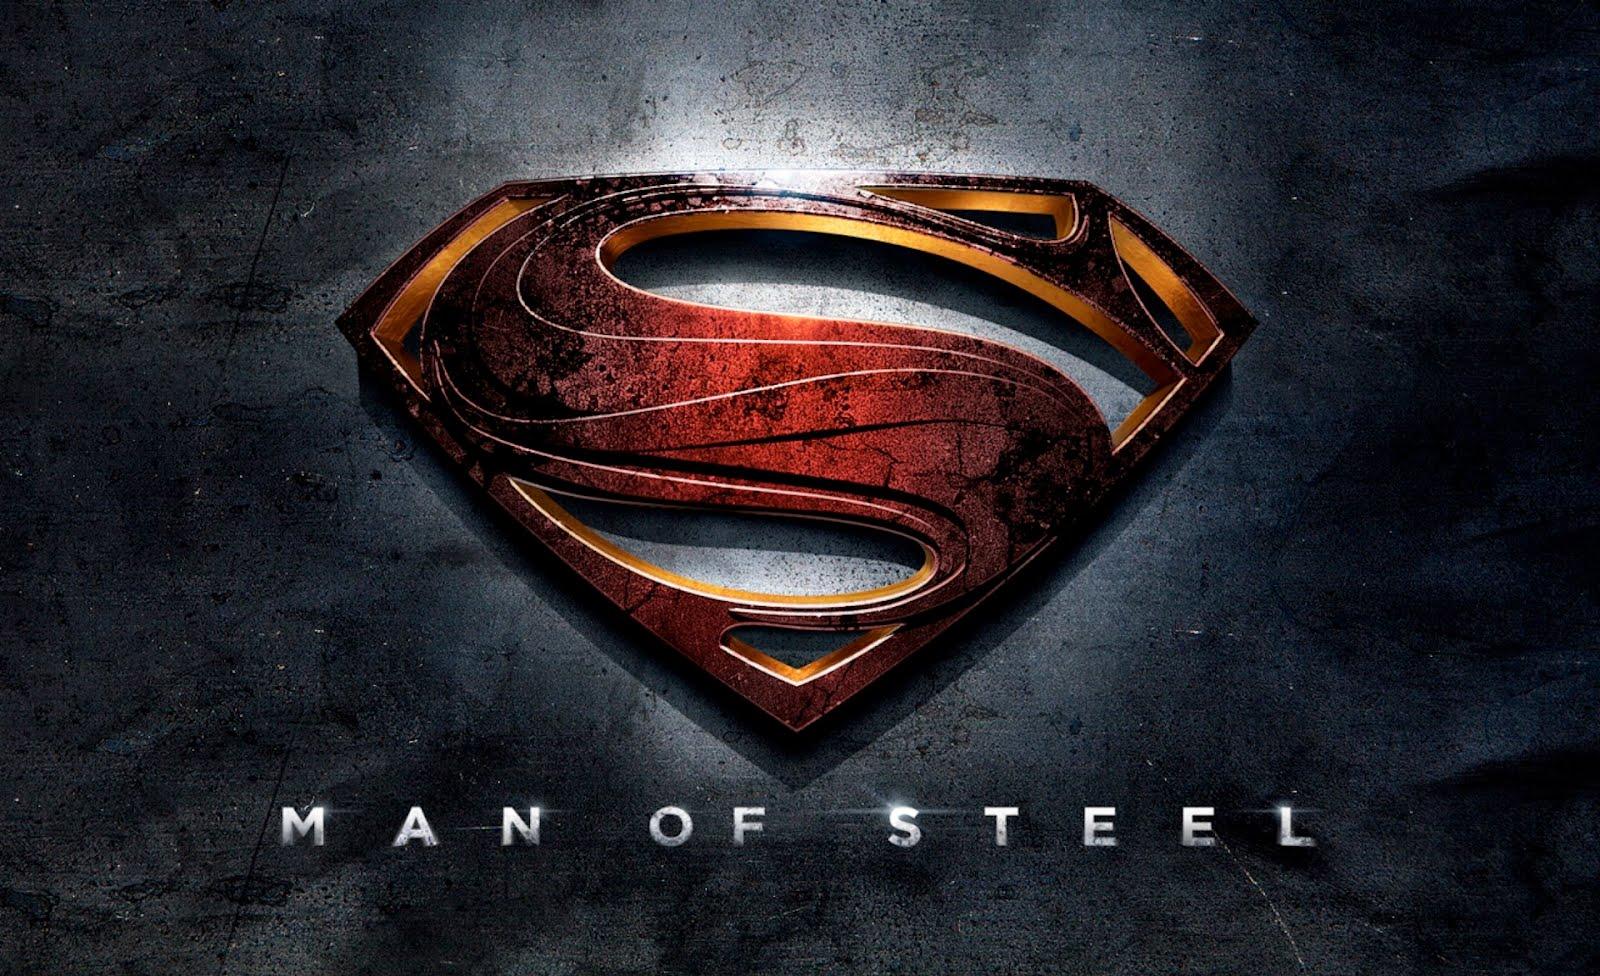 Superman Man of Steel wallpaper 4